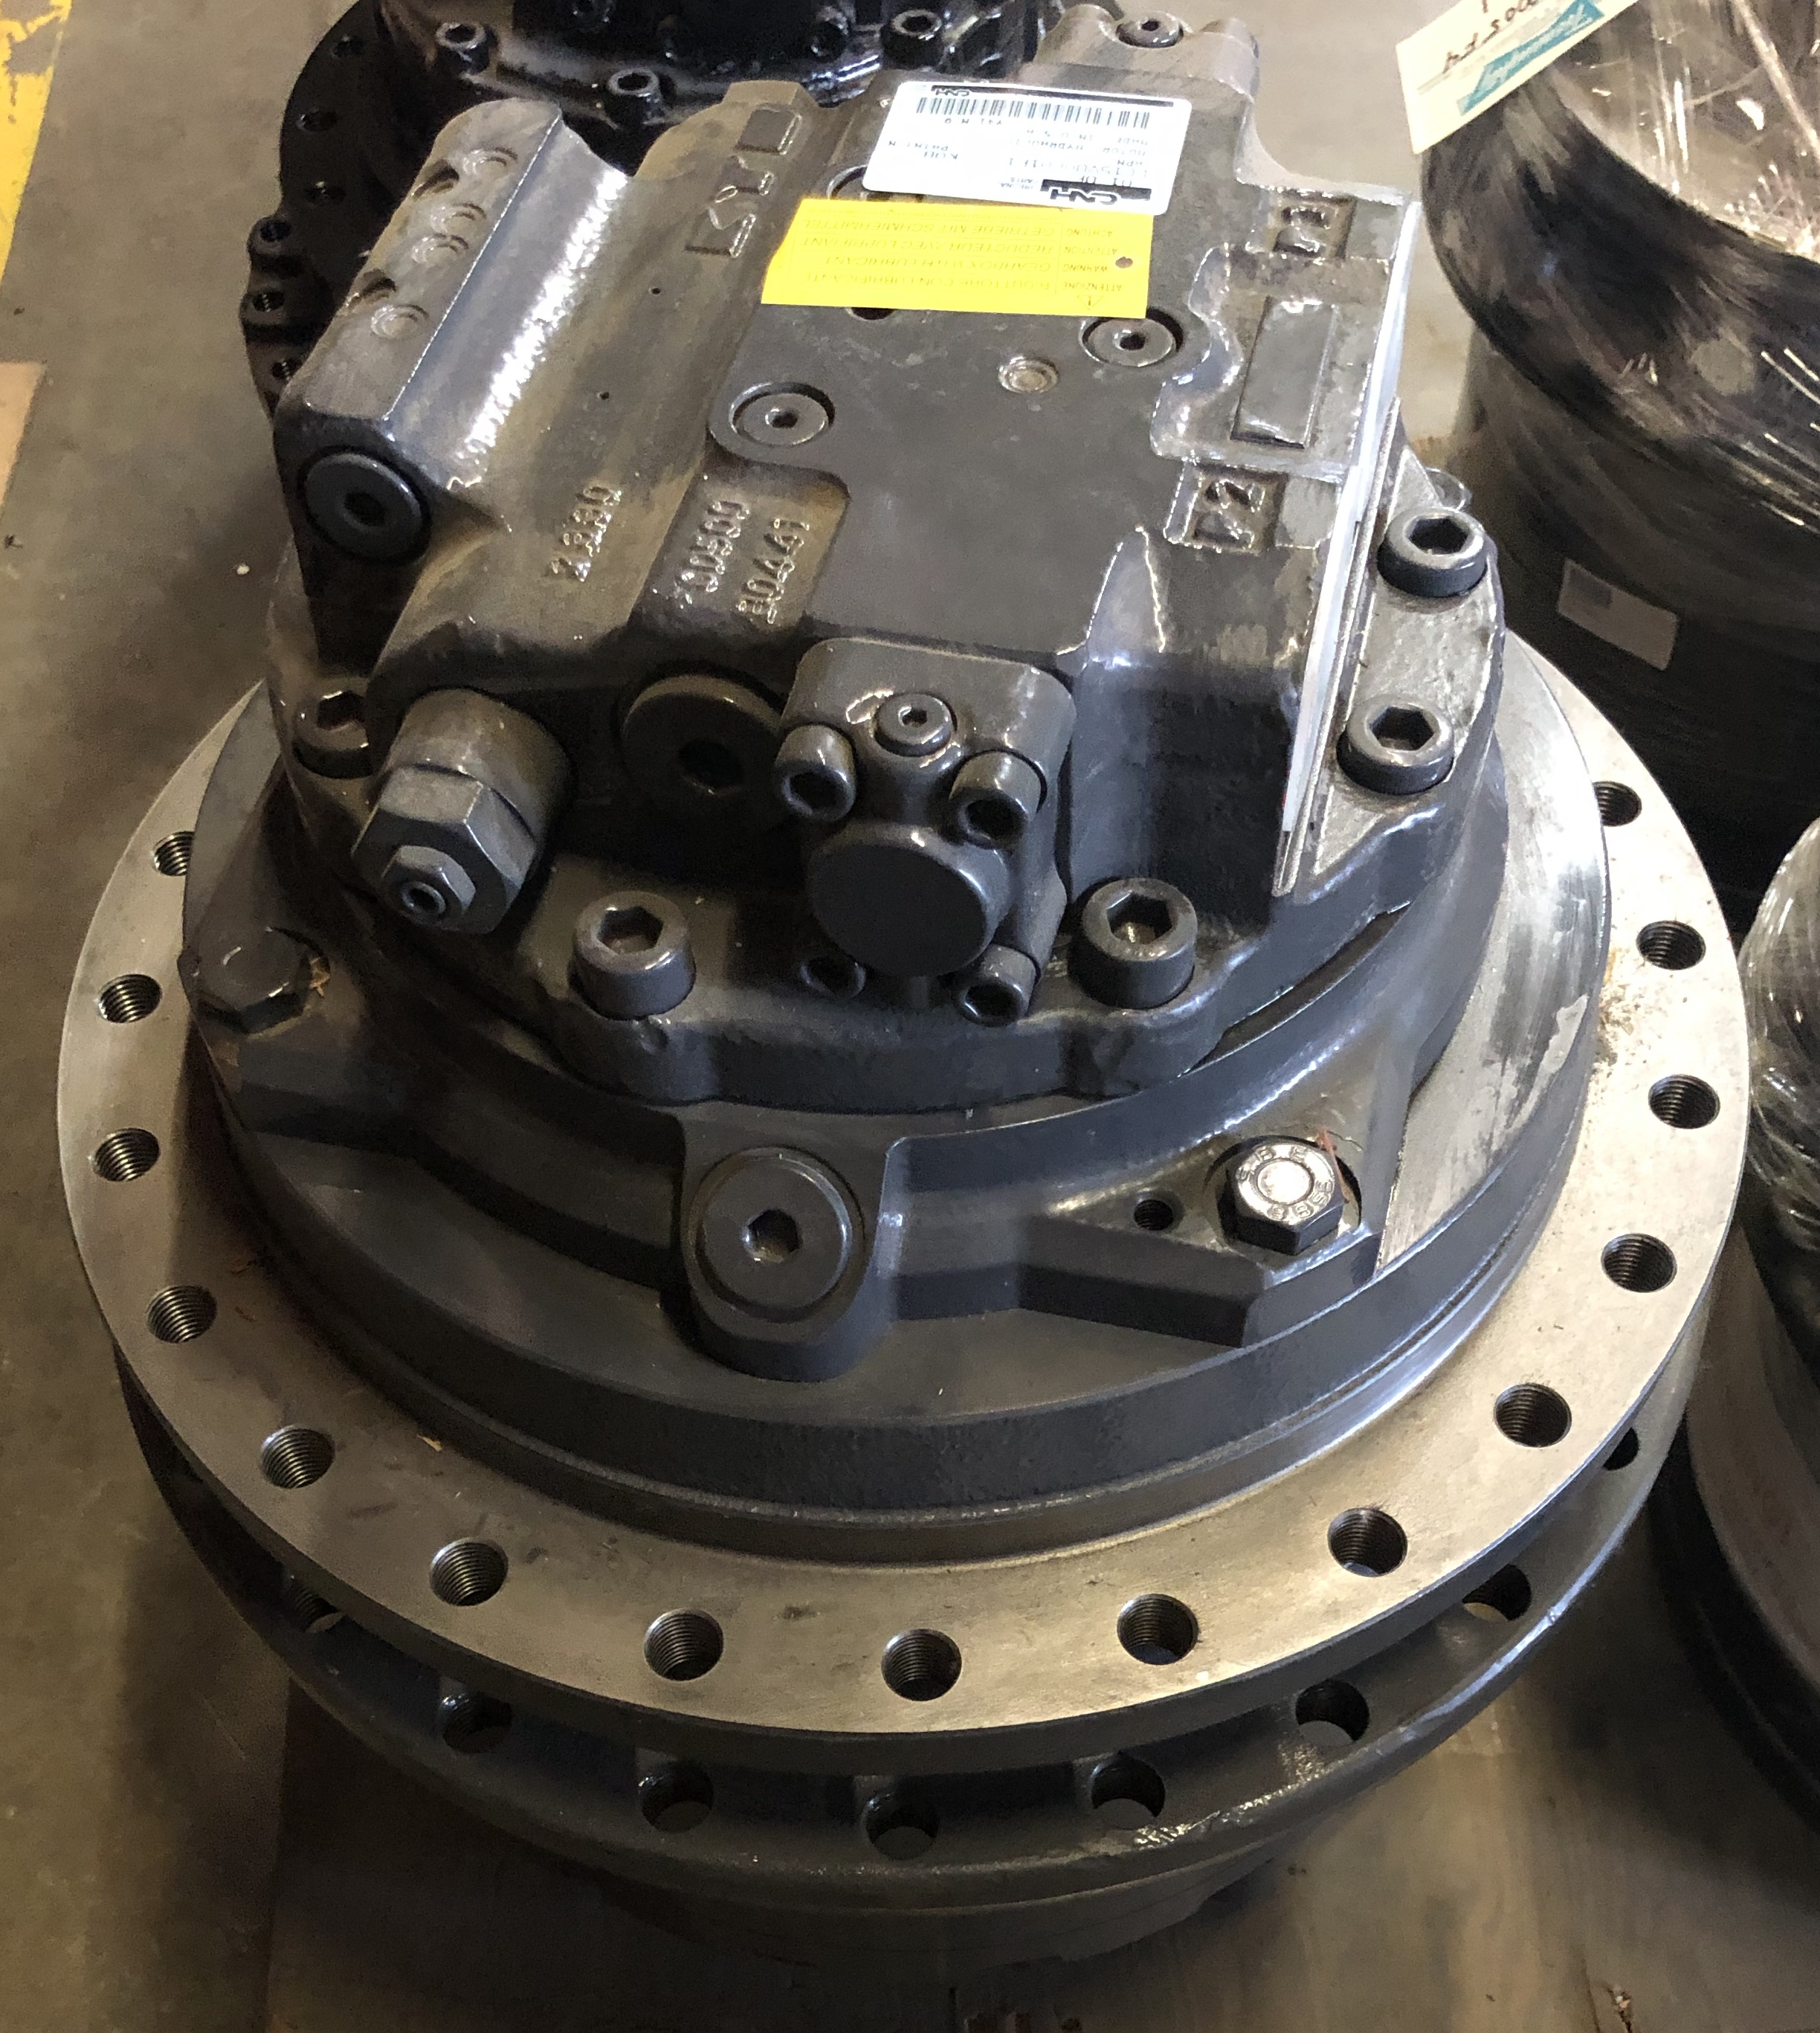 Kobelco SK 350-9 Hydraulic Motor